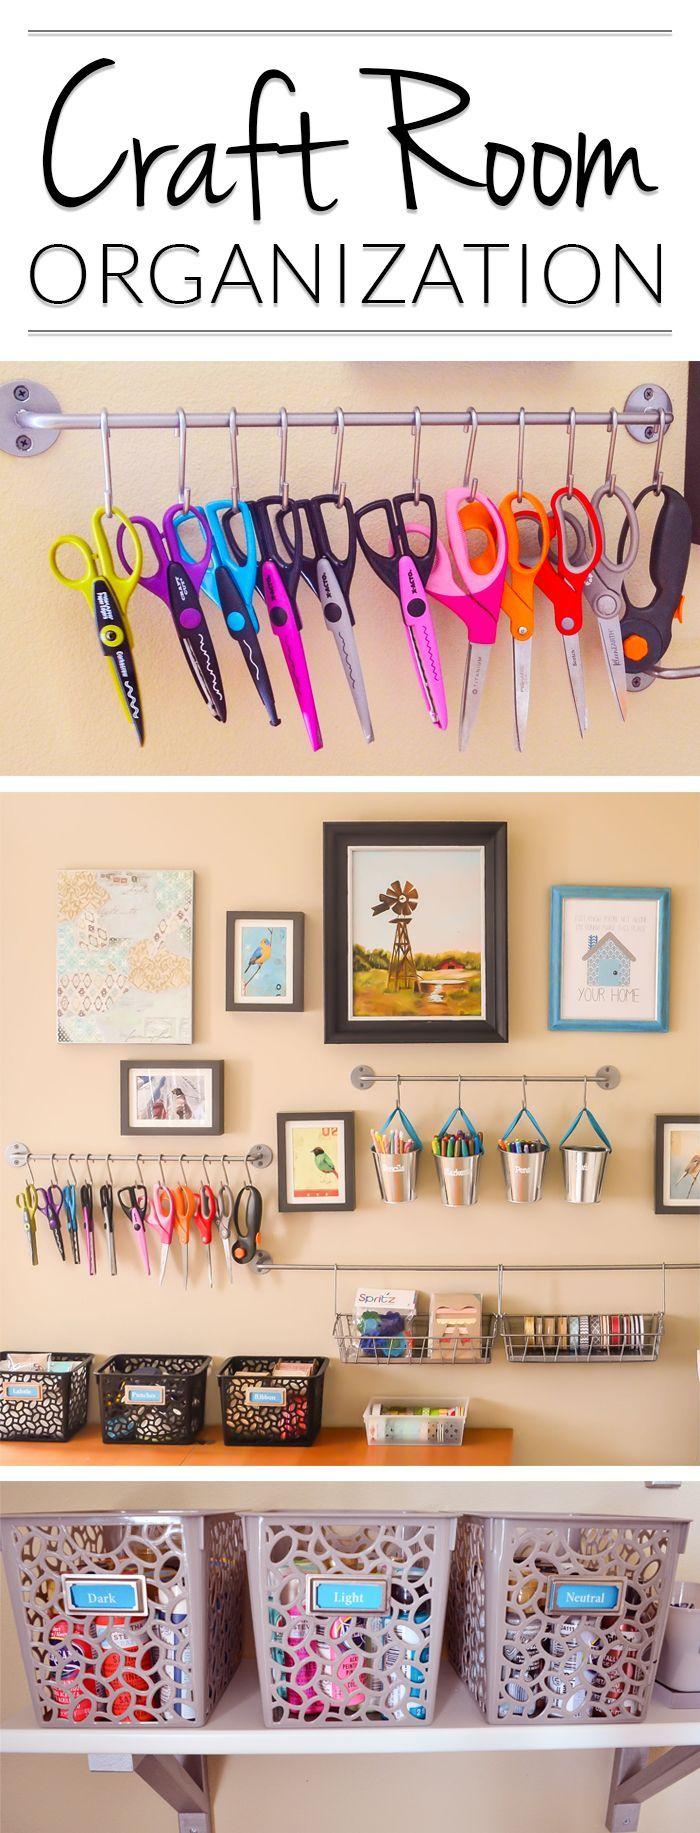 Craft supplies organization ideas - Craft Room Organization Room Reveal Part 2